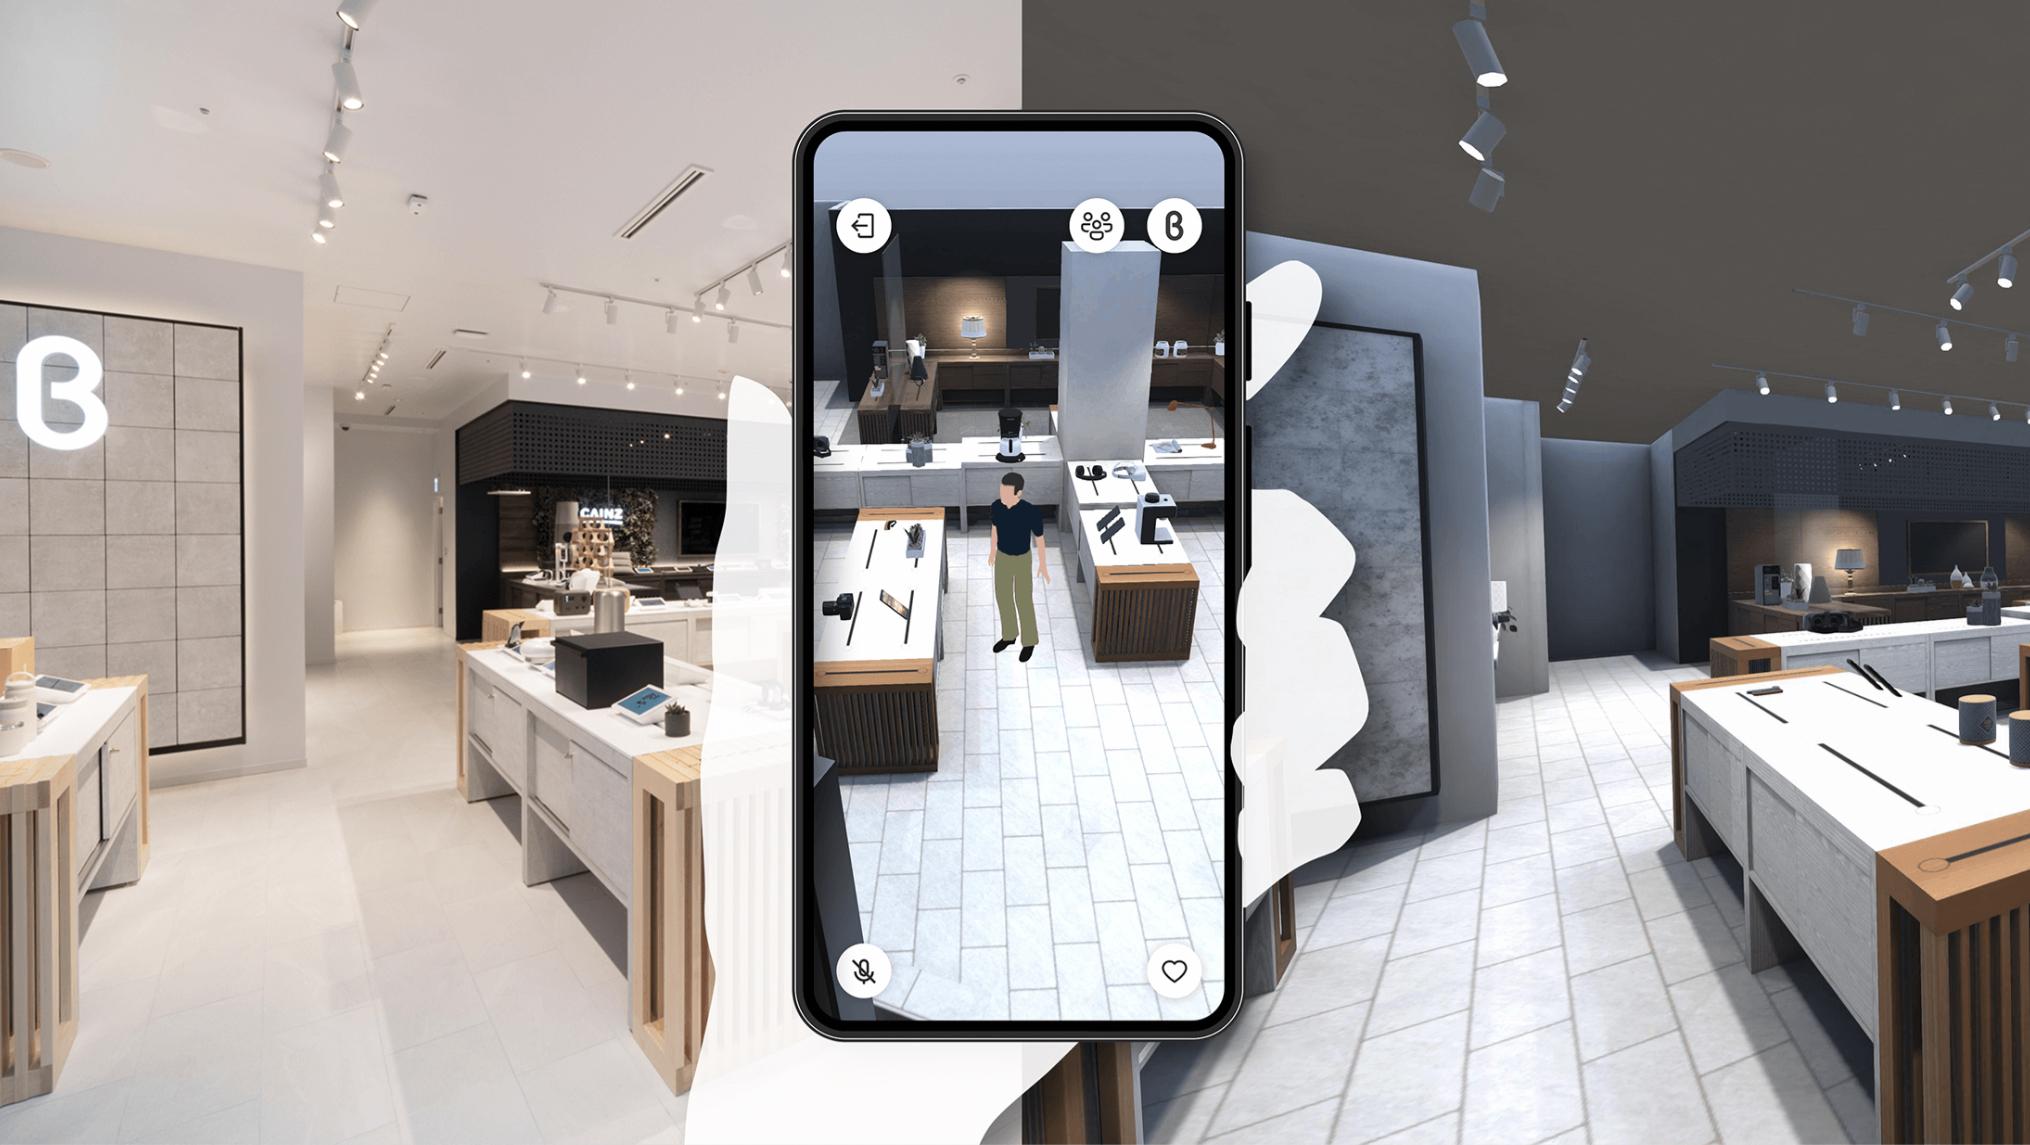 「Virtualb8ta」DigitalTwinShoppingExperience,2021